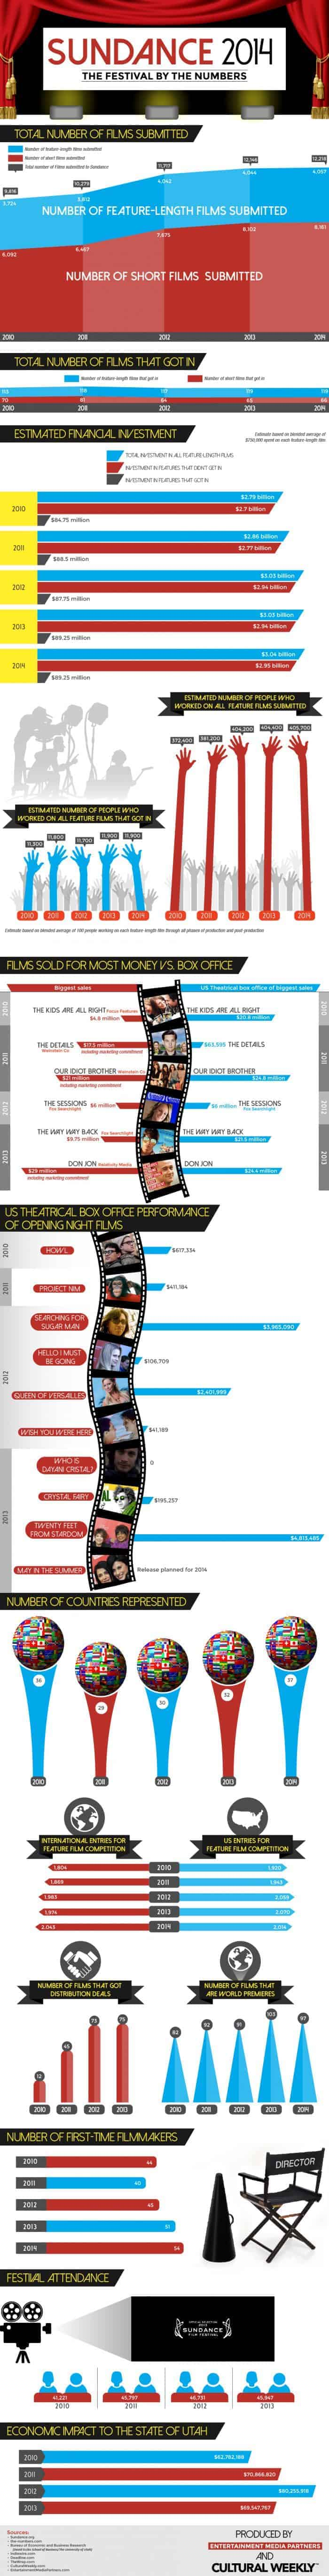 Sundance 2014 Infographic